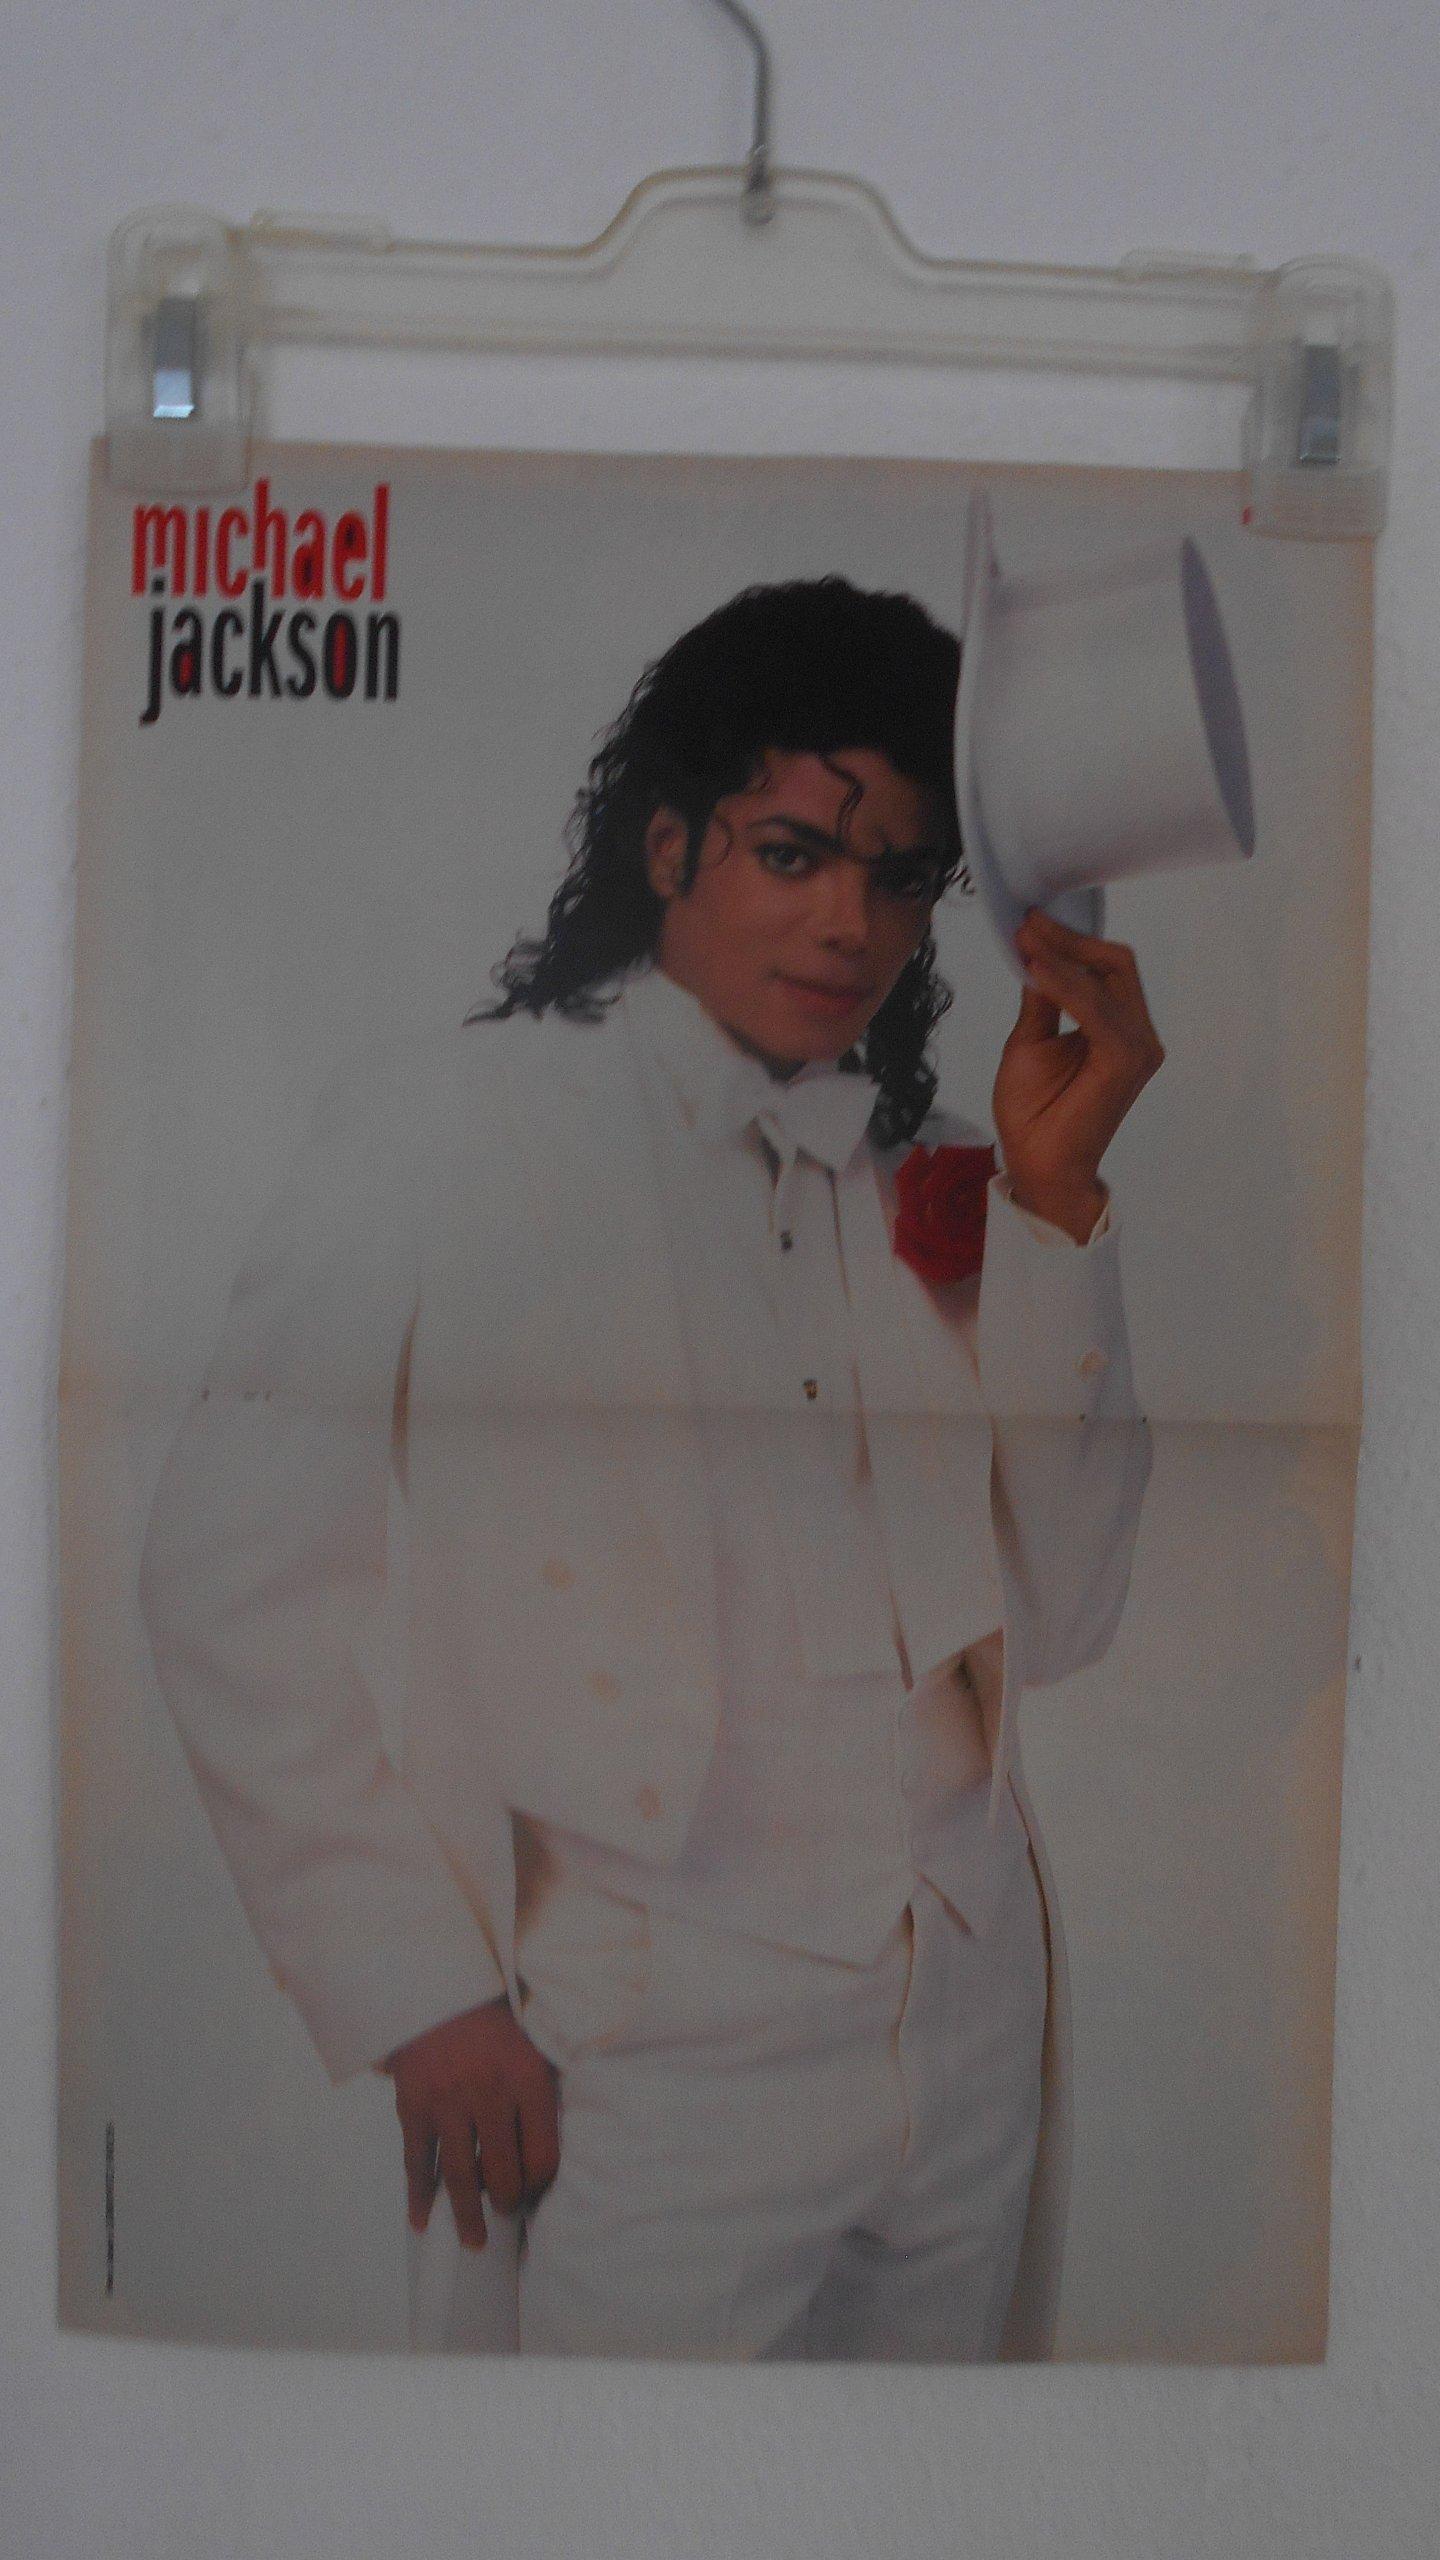 Michael Jackson Plakat Patrz Opis